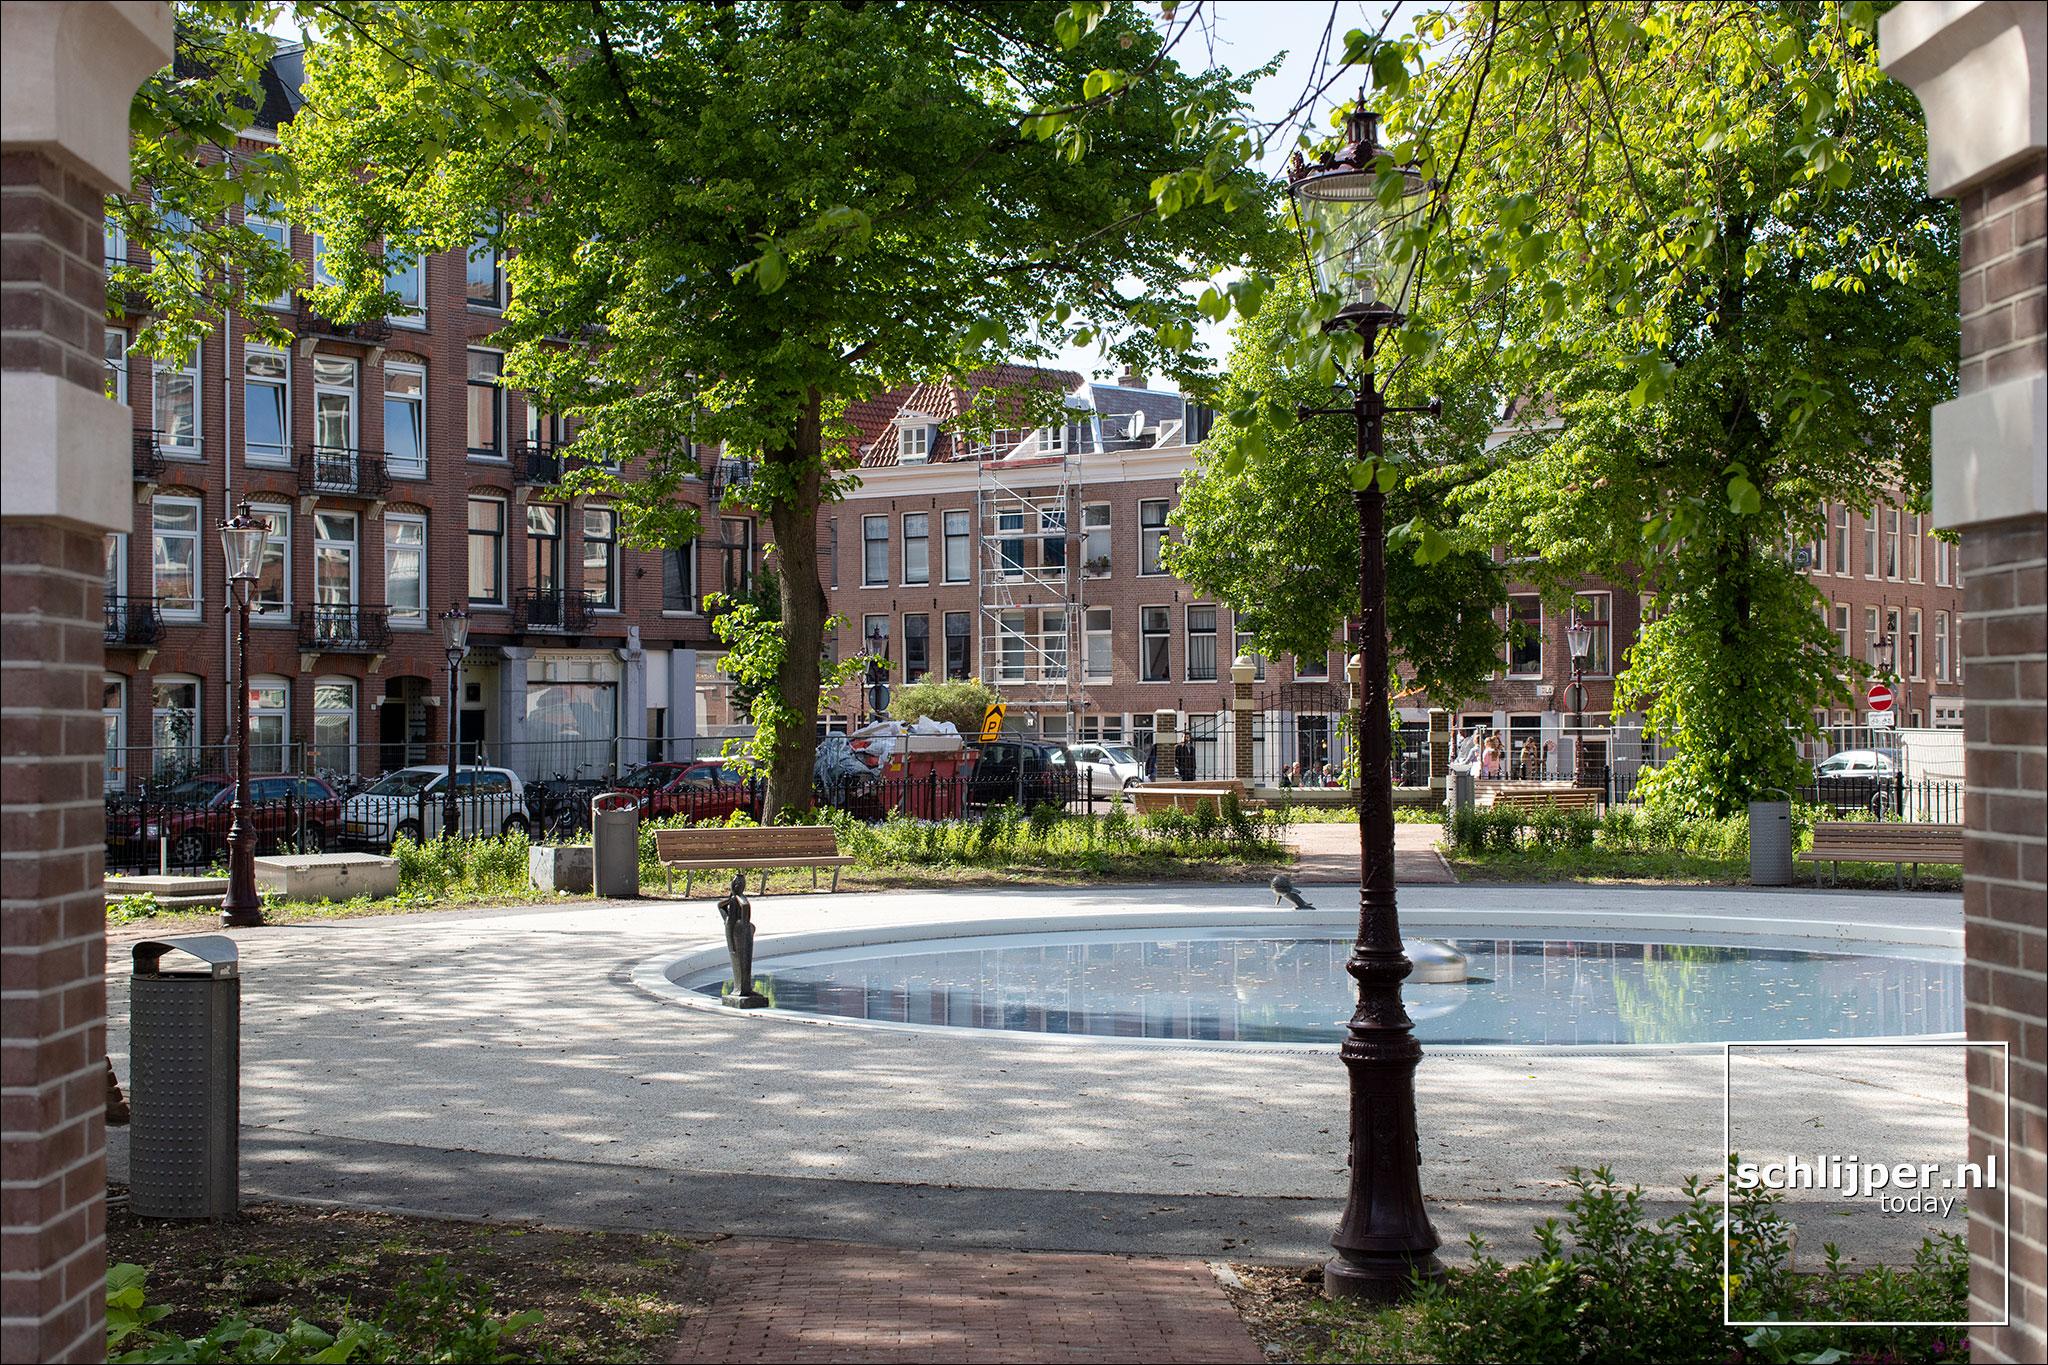 Nederland, Amsterdam, 11 mei 2019